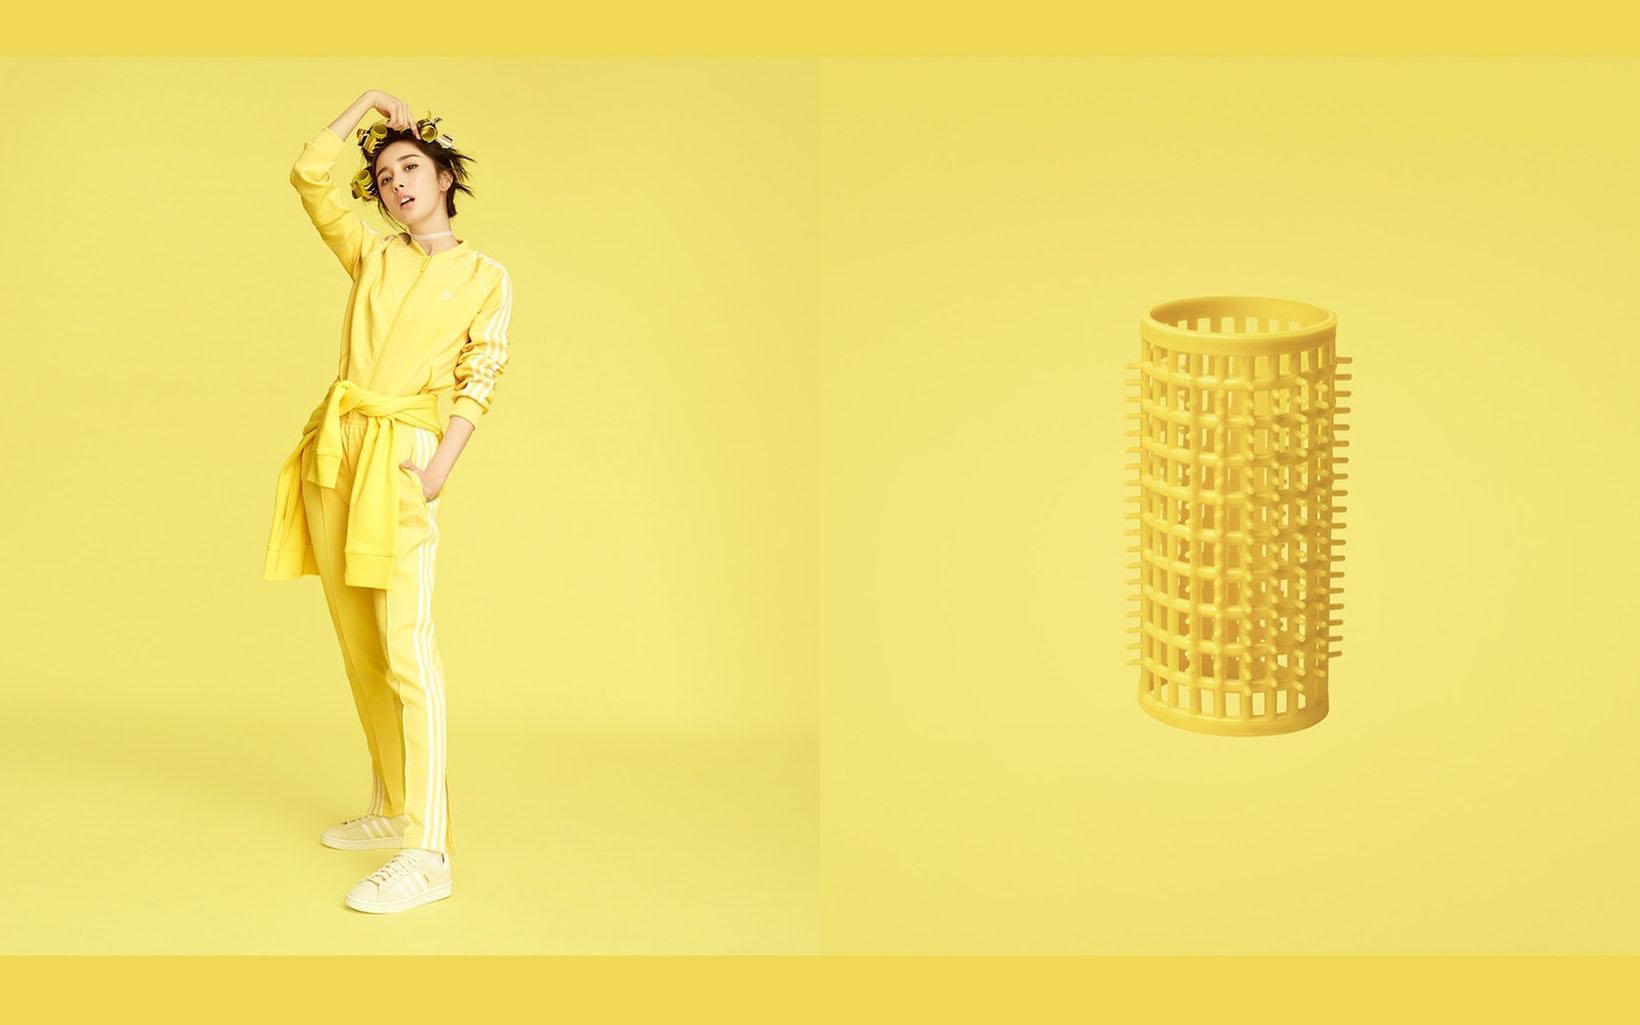 adidas-spring-summer-2018-adicolor-series-collection-7